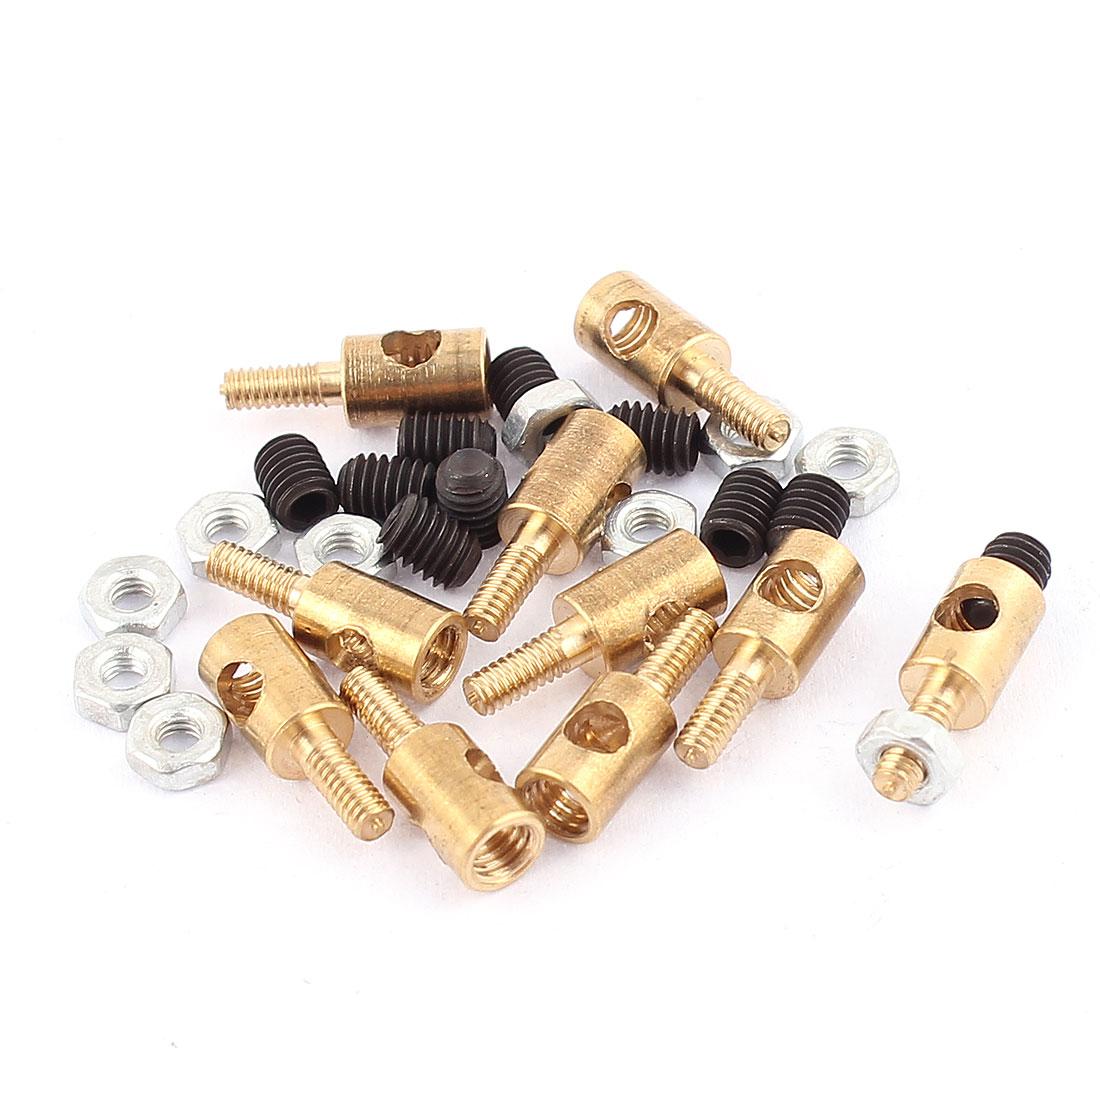 10pcs 4mmx2.5mm Pushrod Linkage Stopper Metal for RC Model w Nuts